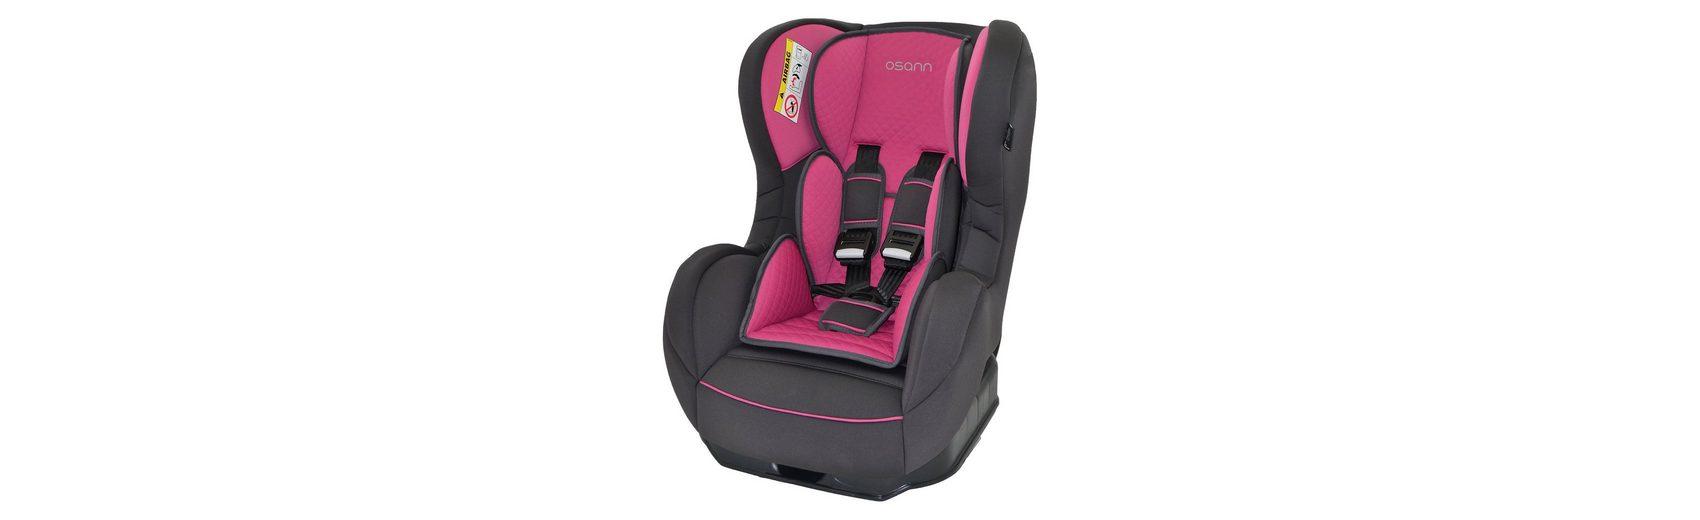 Osann Auto-Kindersitz Safety One, Quilt Framboise, 2016